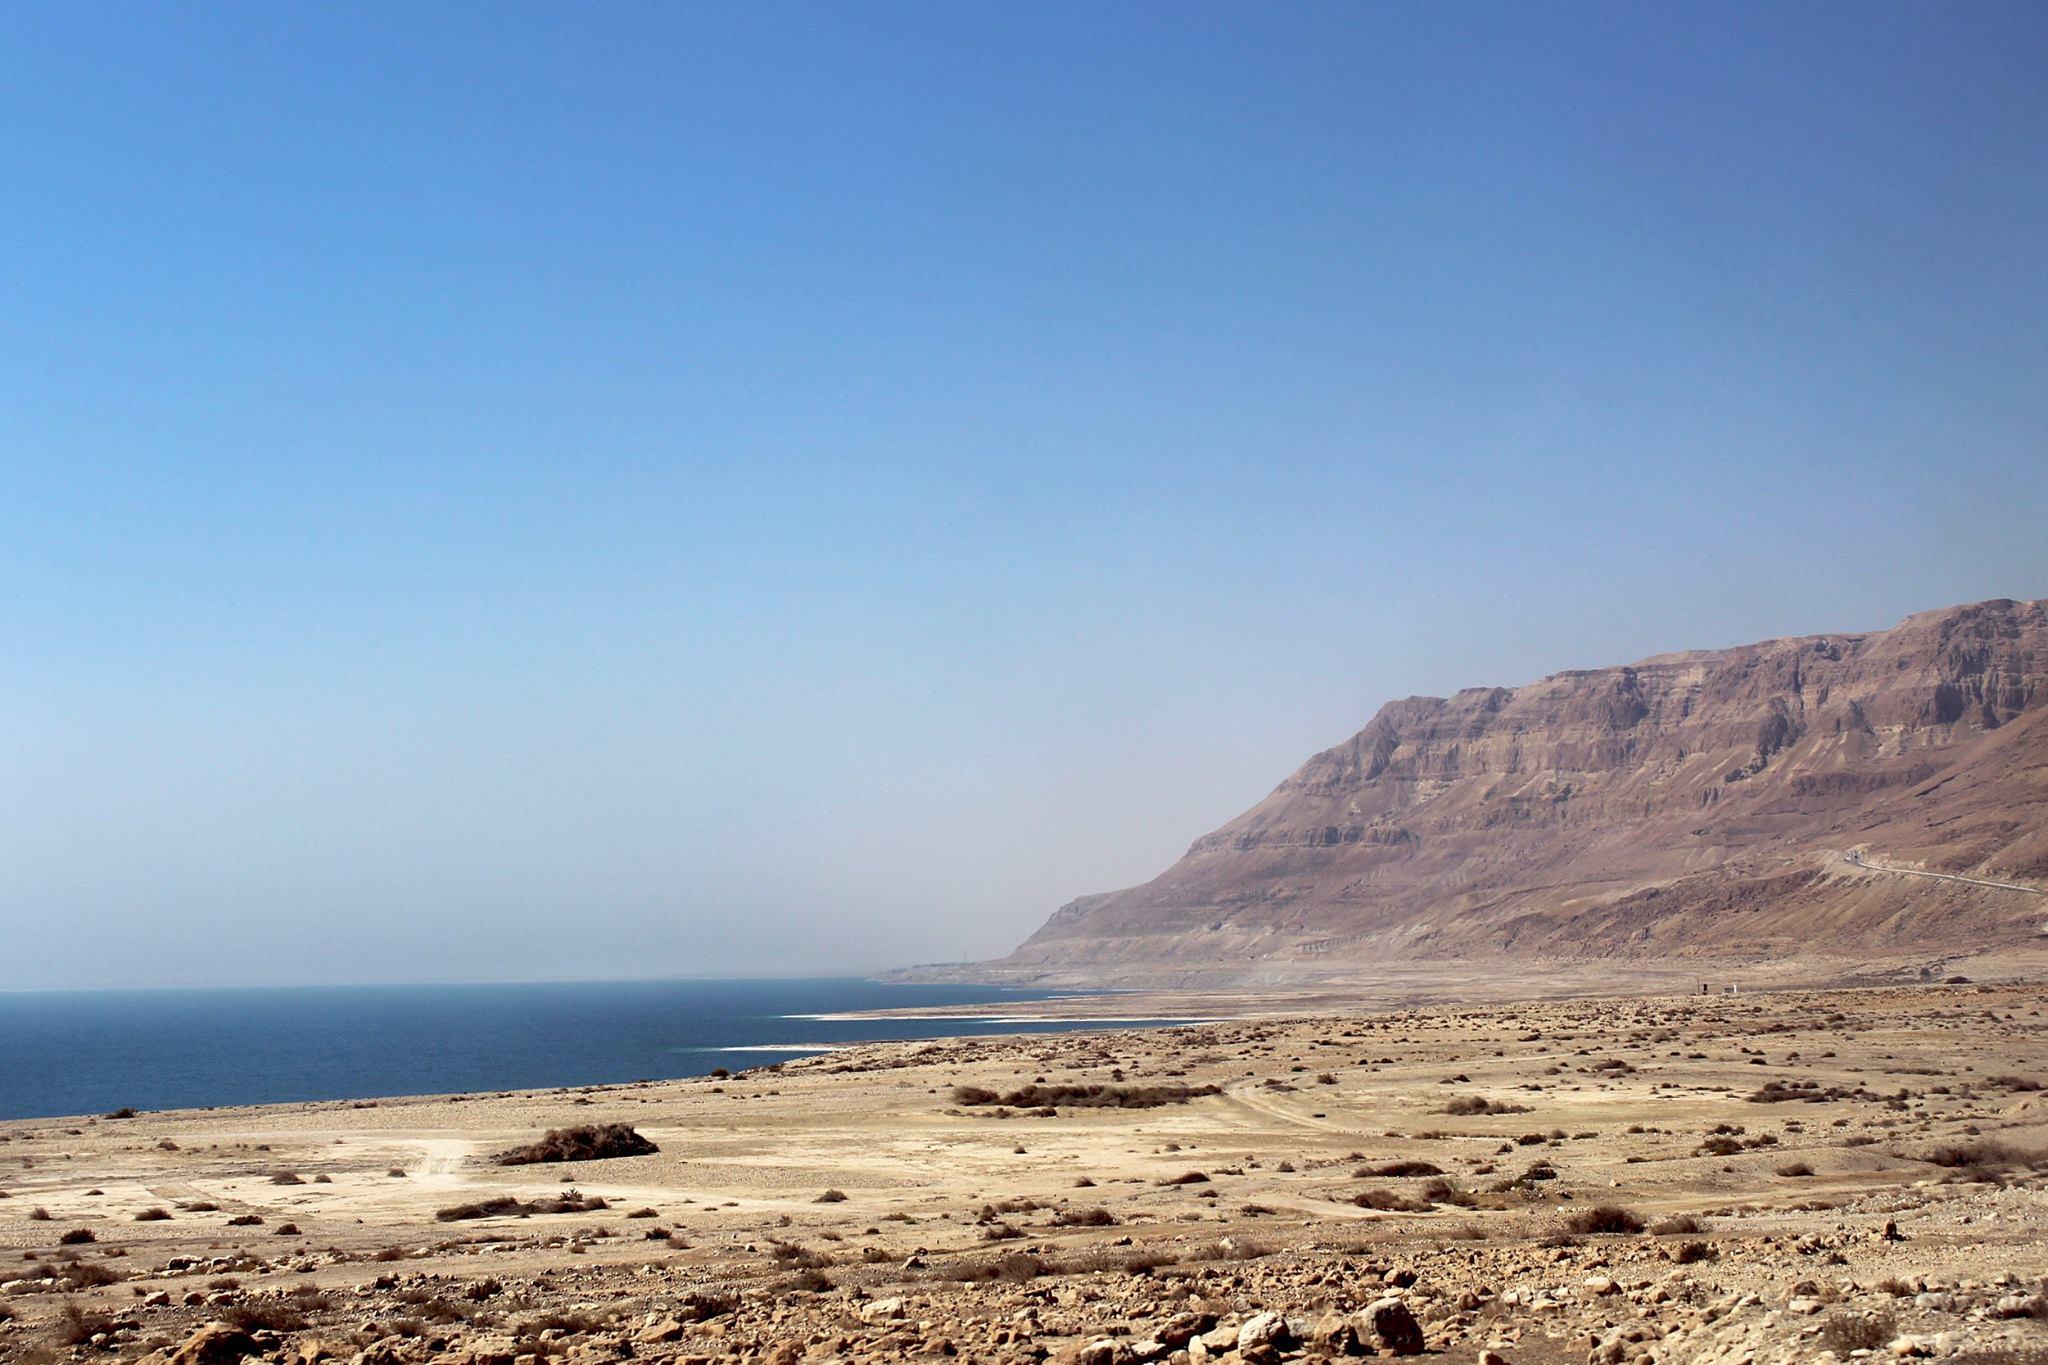 mrtve more izrael palestina